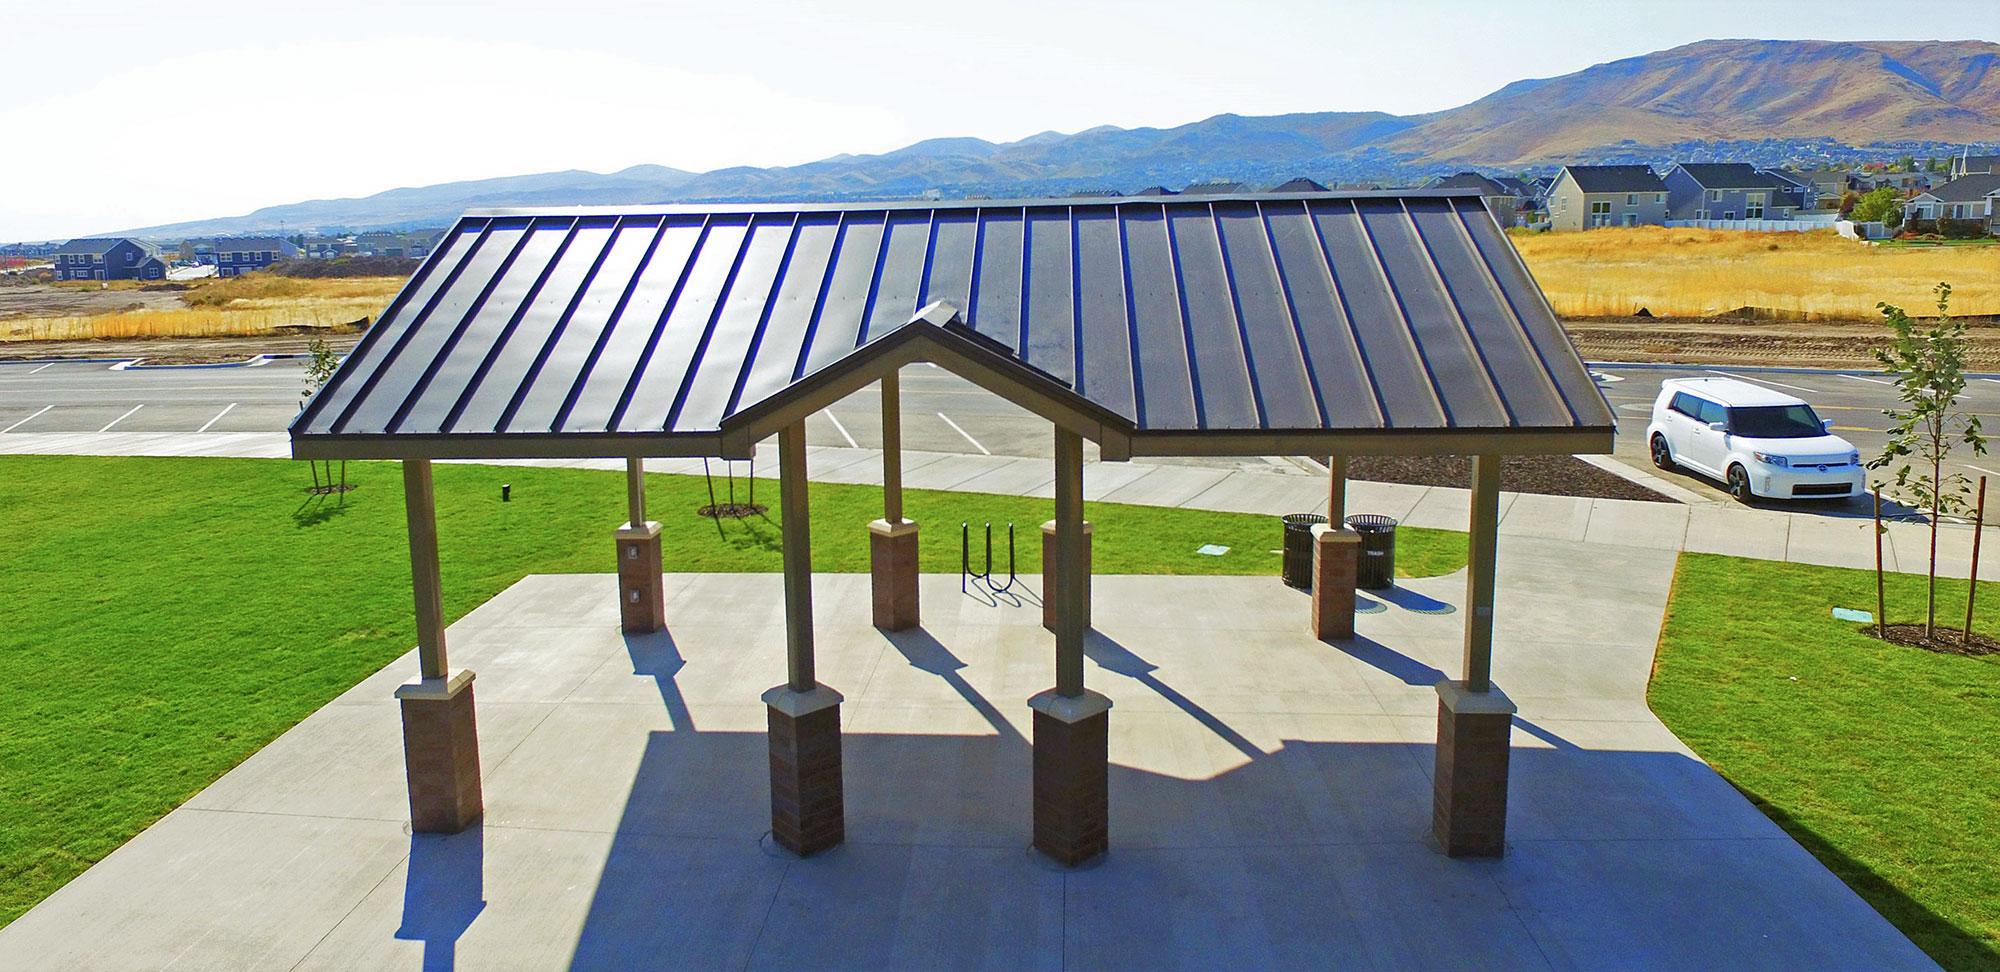 shade shelter park